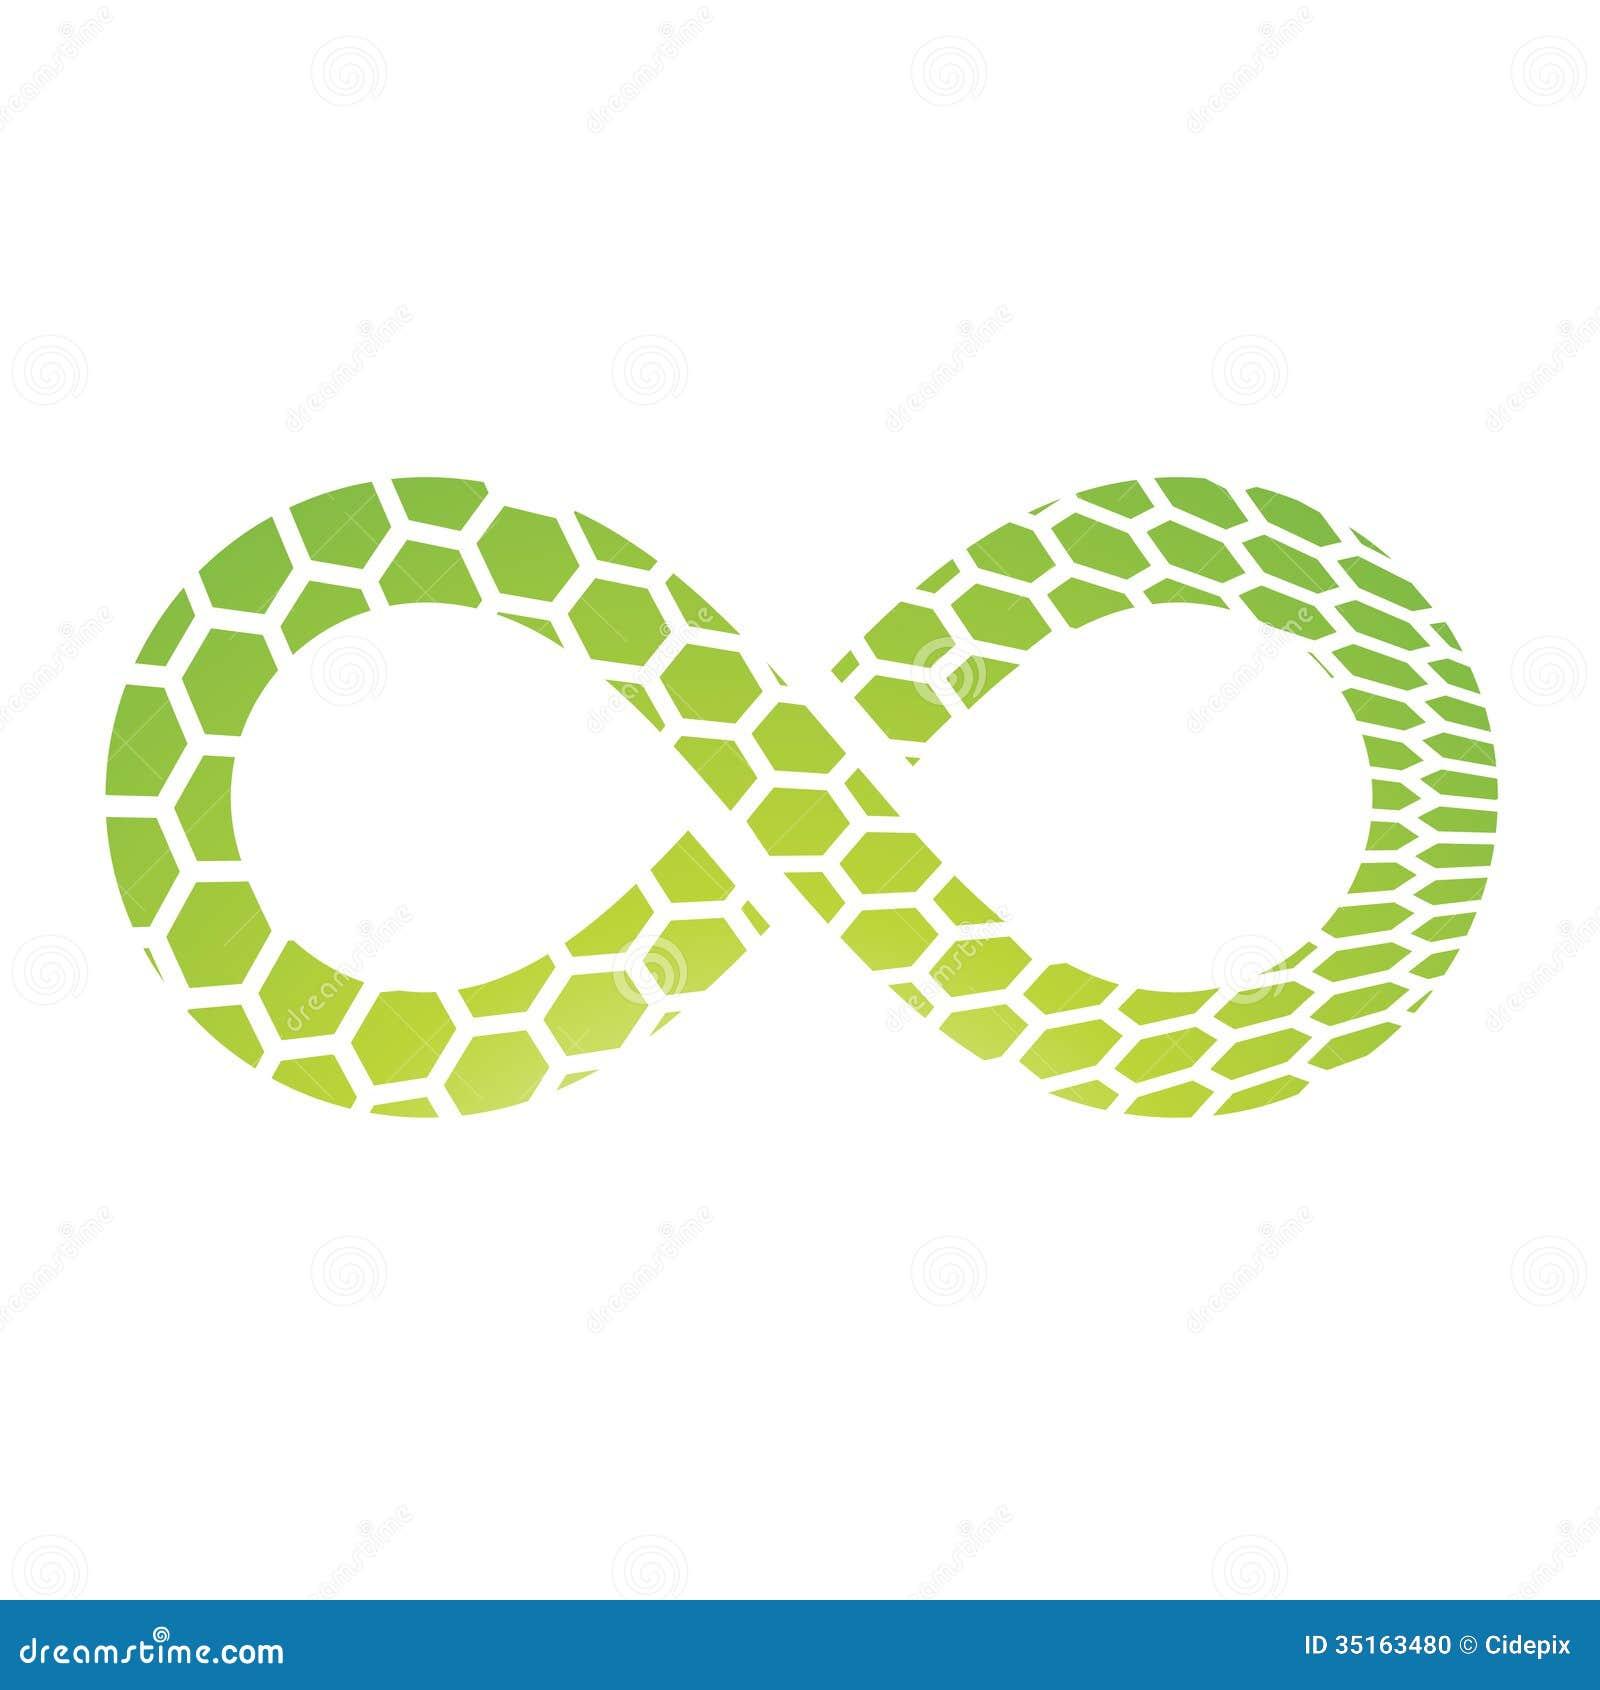 Infinity Symbol Design Stock Vector Illustration Of Image 35163480